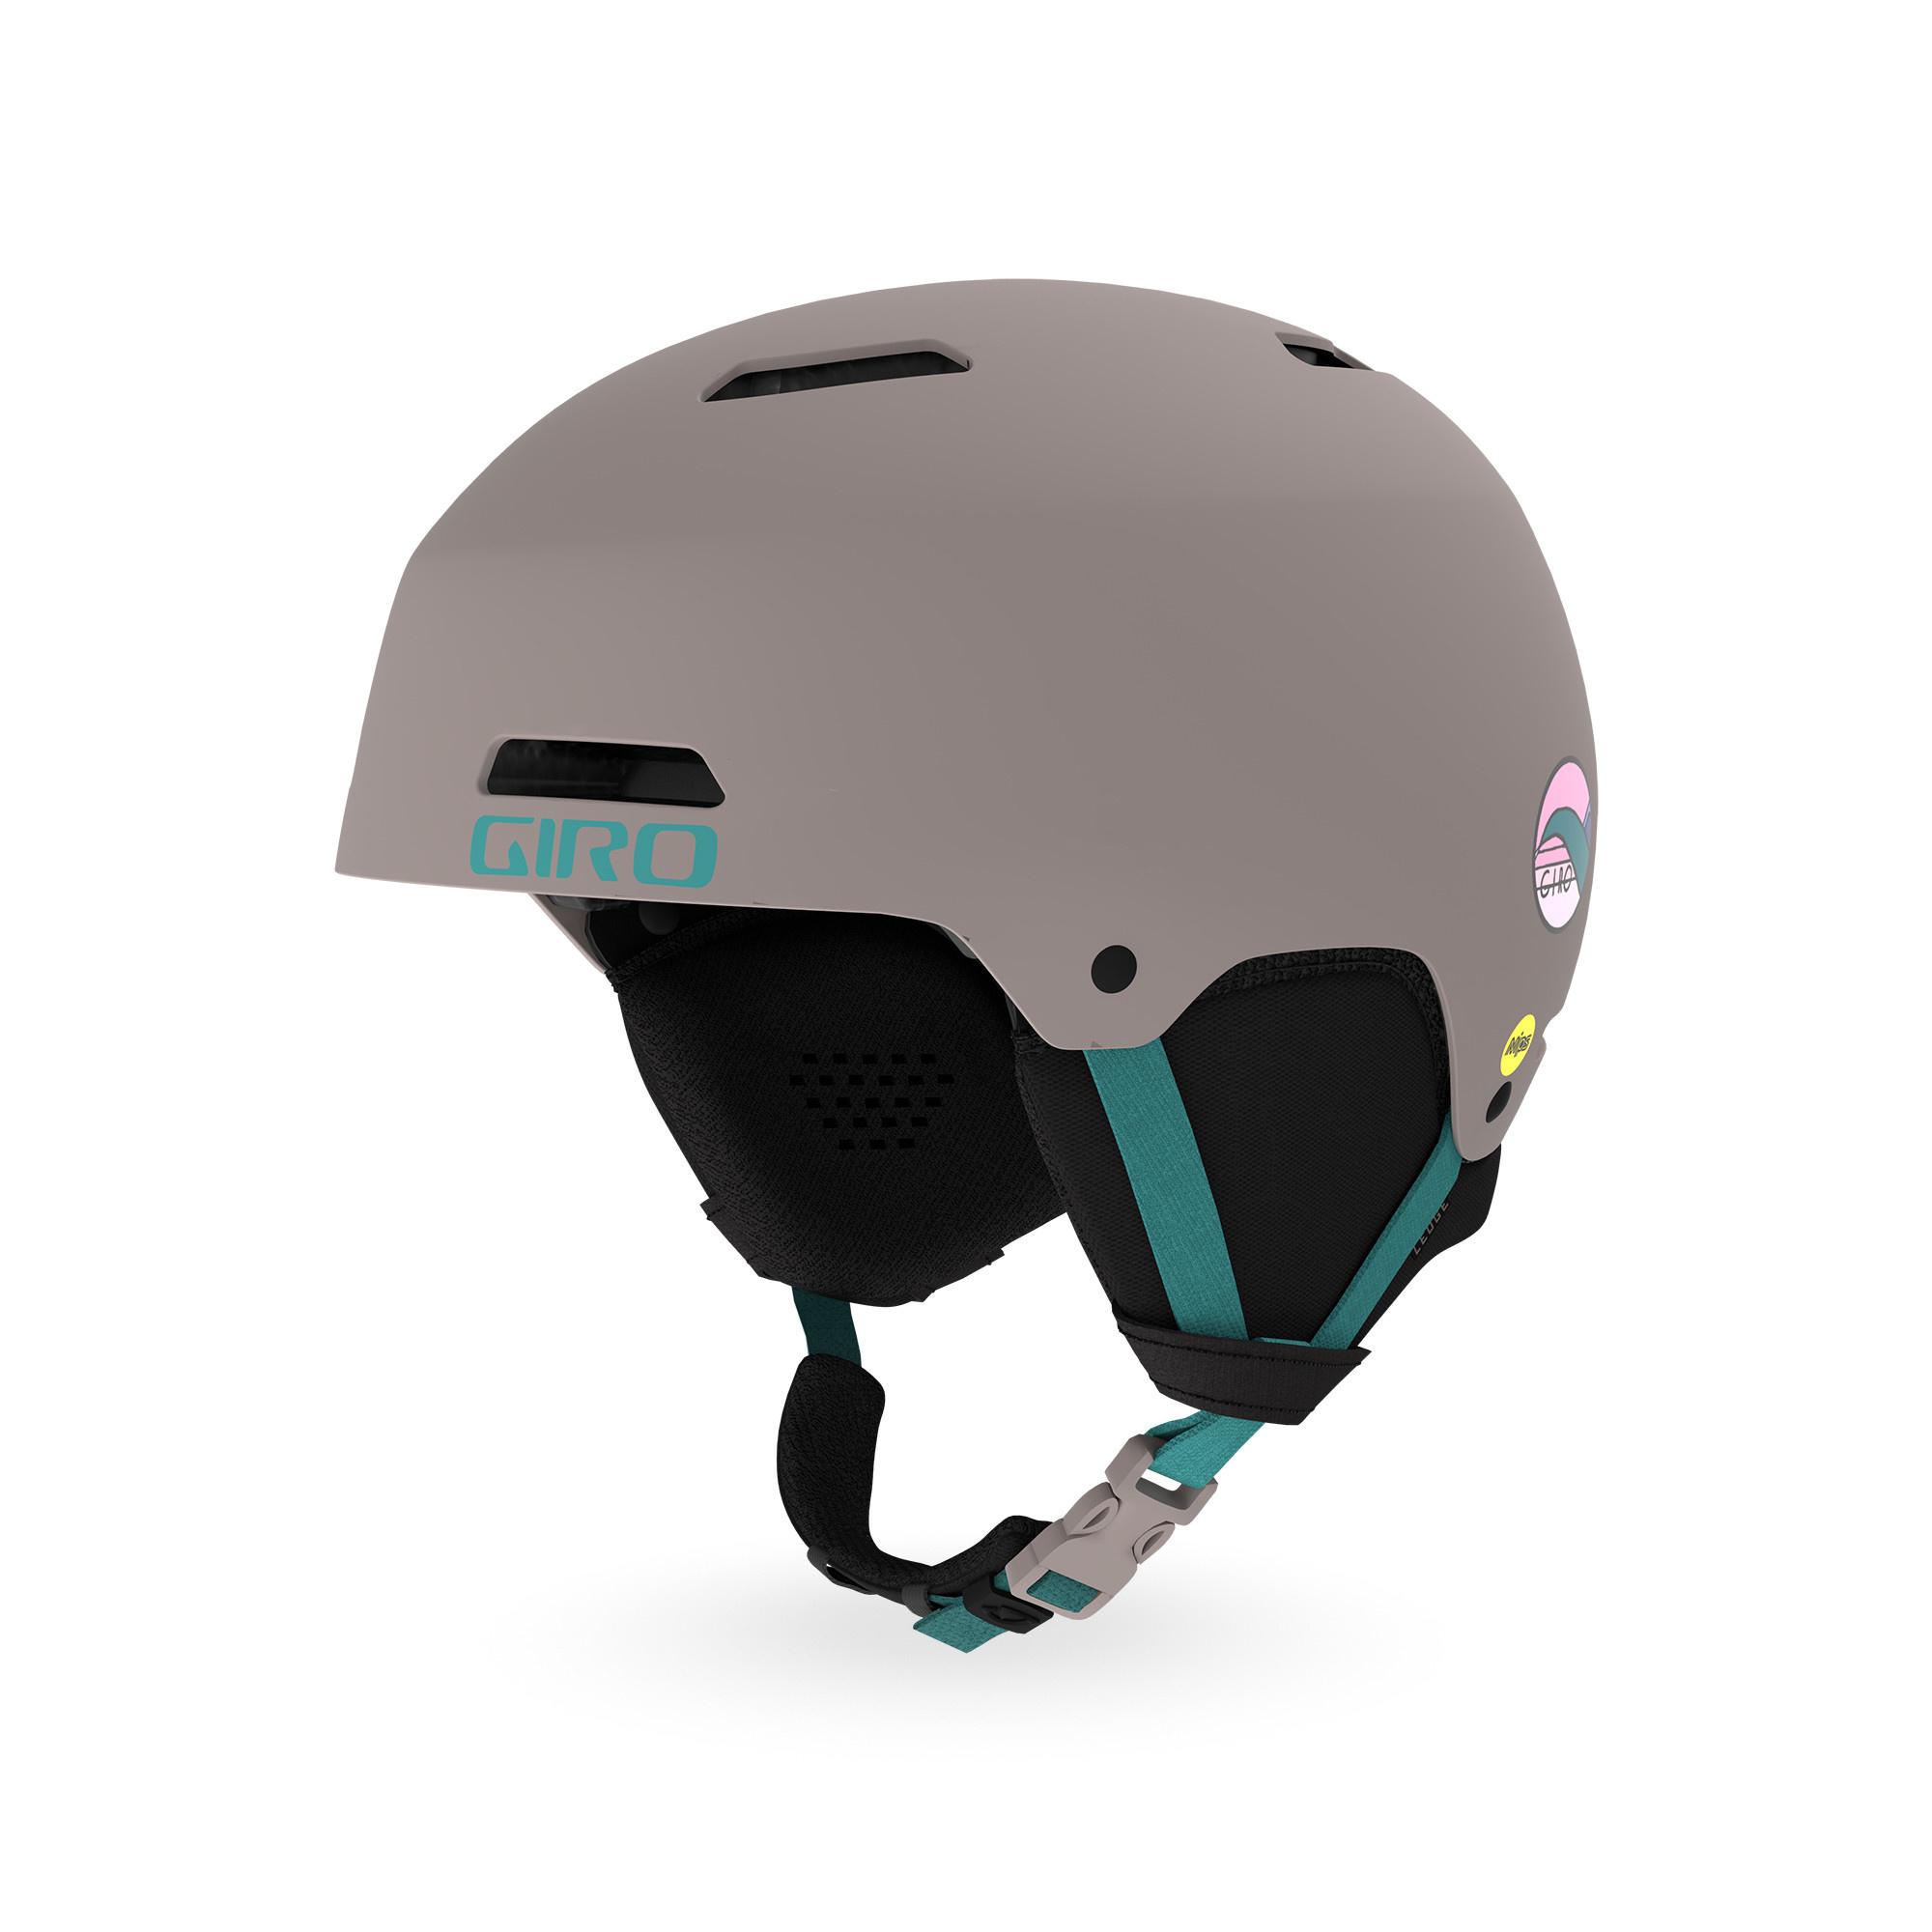 Ledge Fit System Mips Helmet 2019/2020